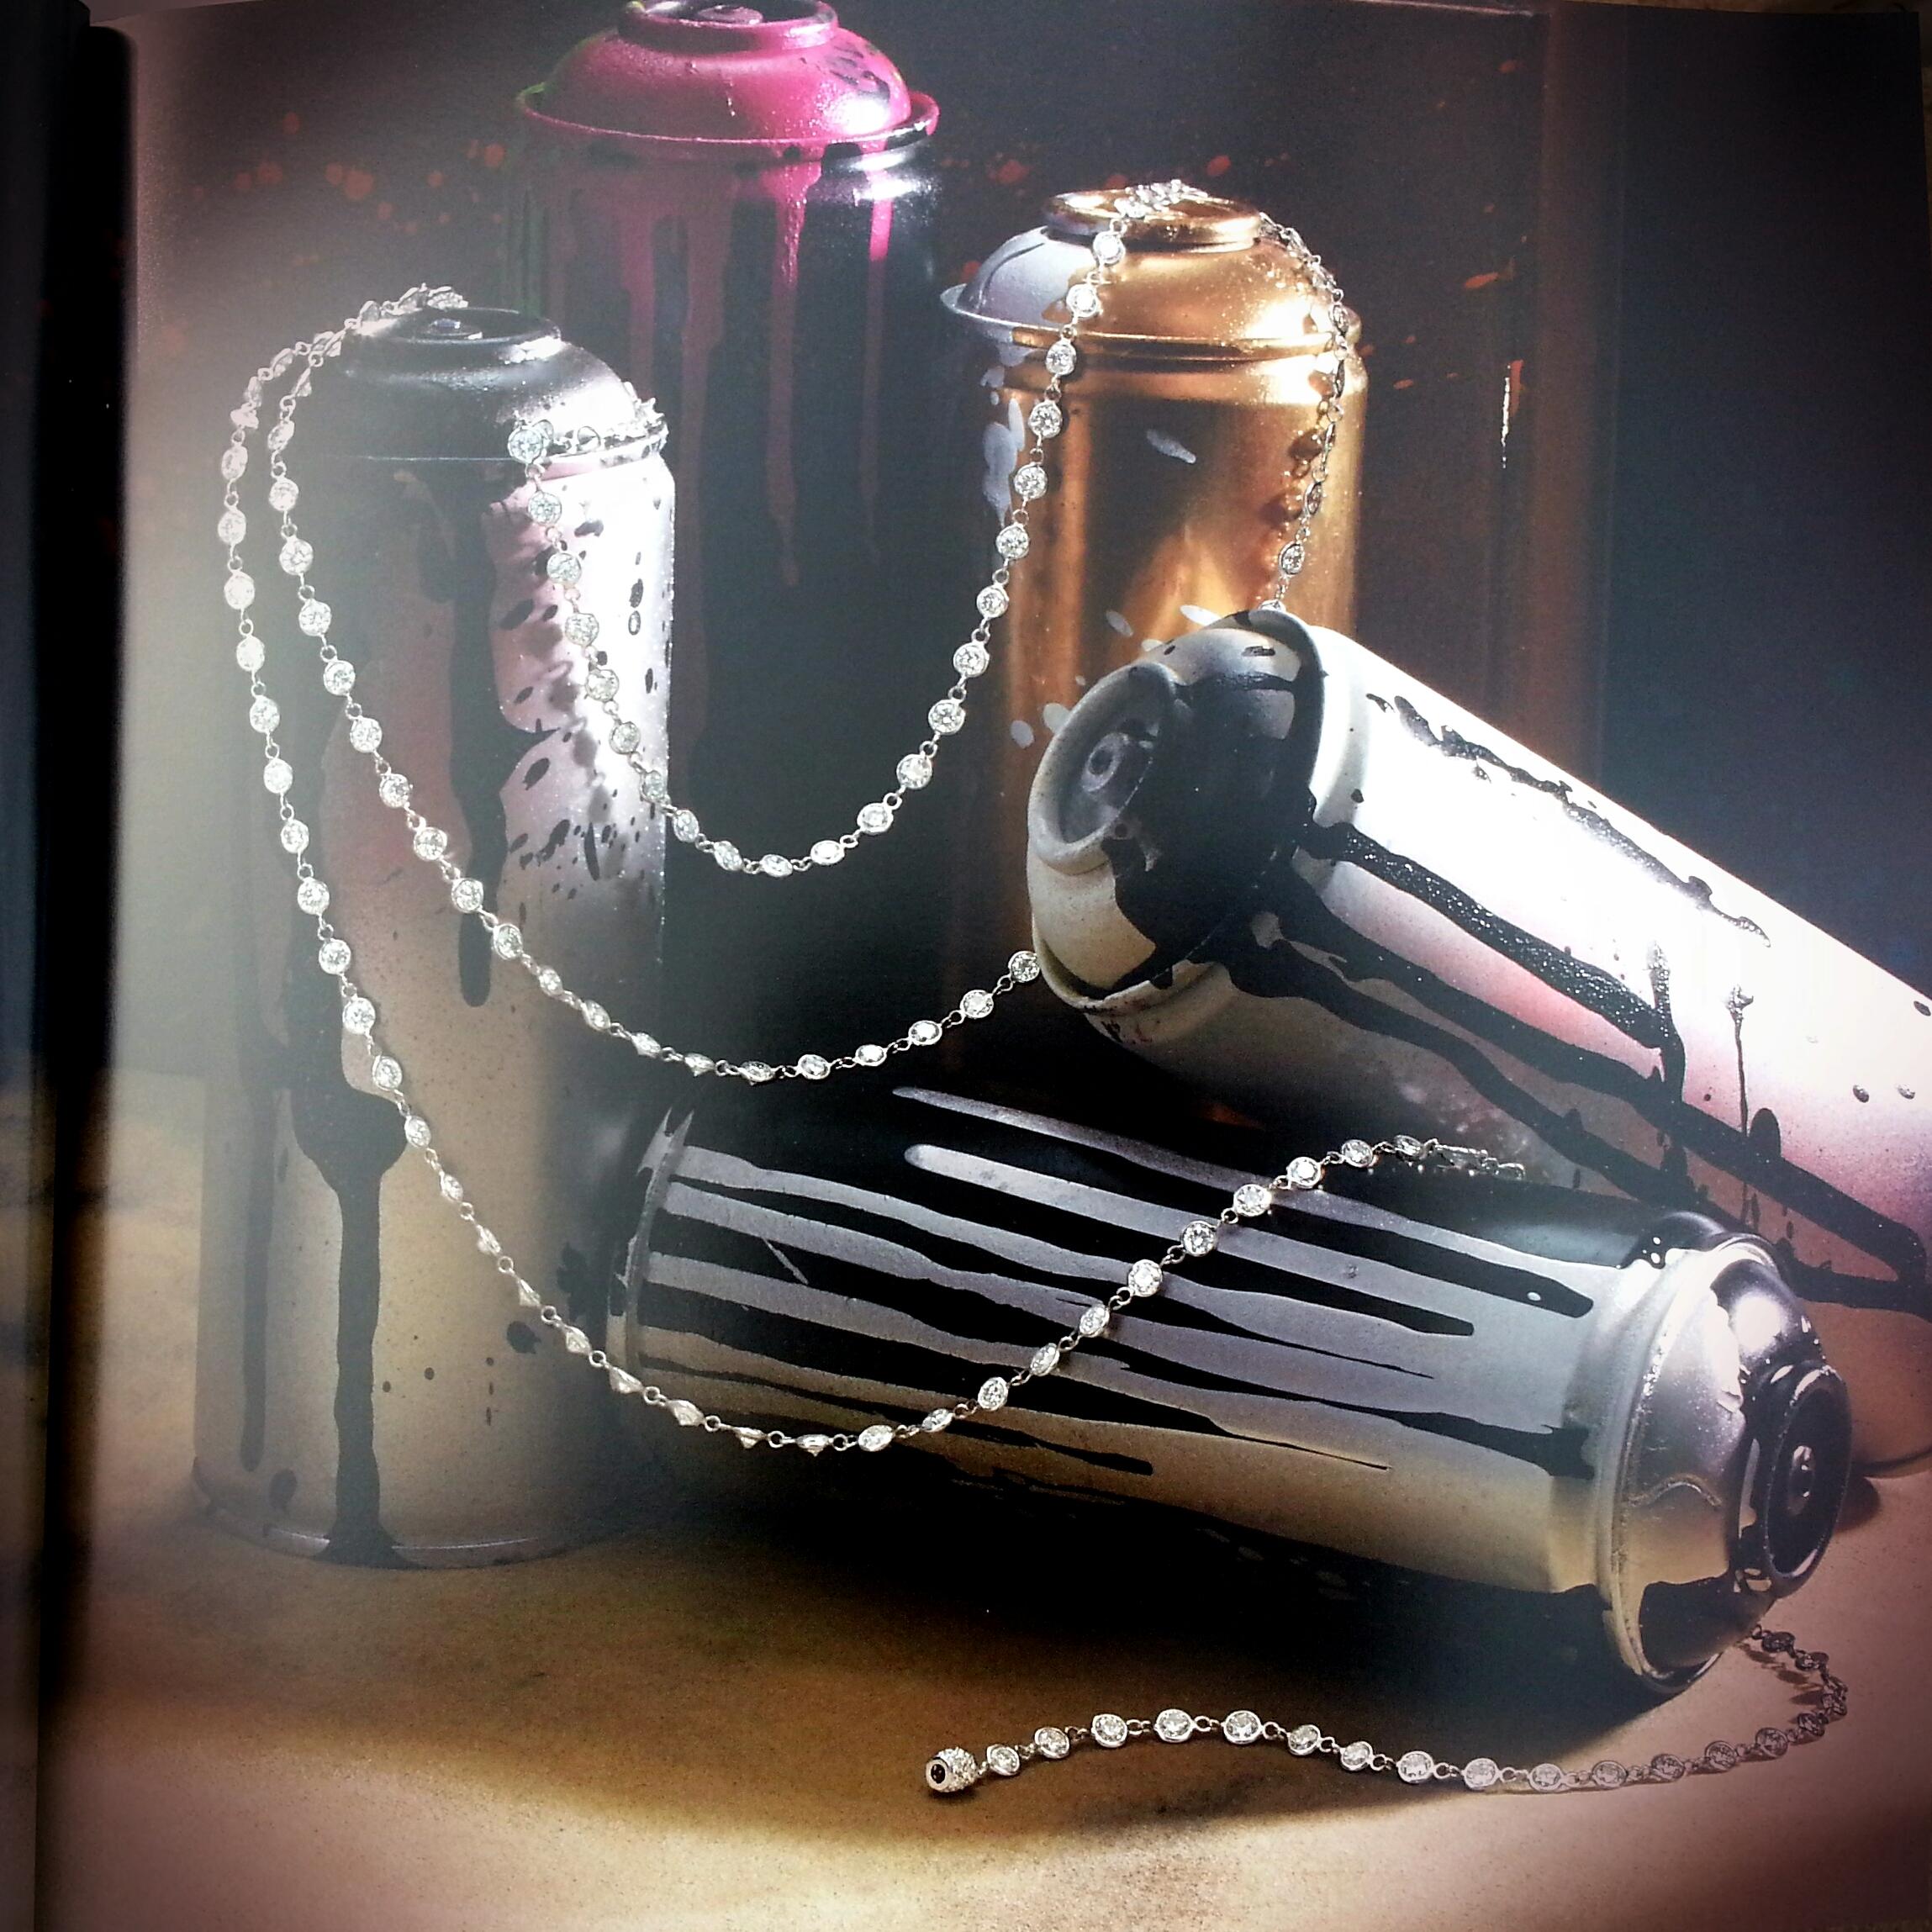 Diamond Chain Necklace set with 144 Round Brilliant Cut Diamonds - 46.50 ctw. Artwork, spraycans by Scape.